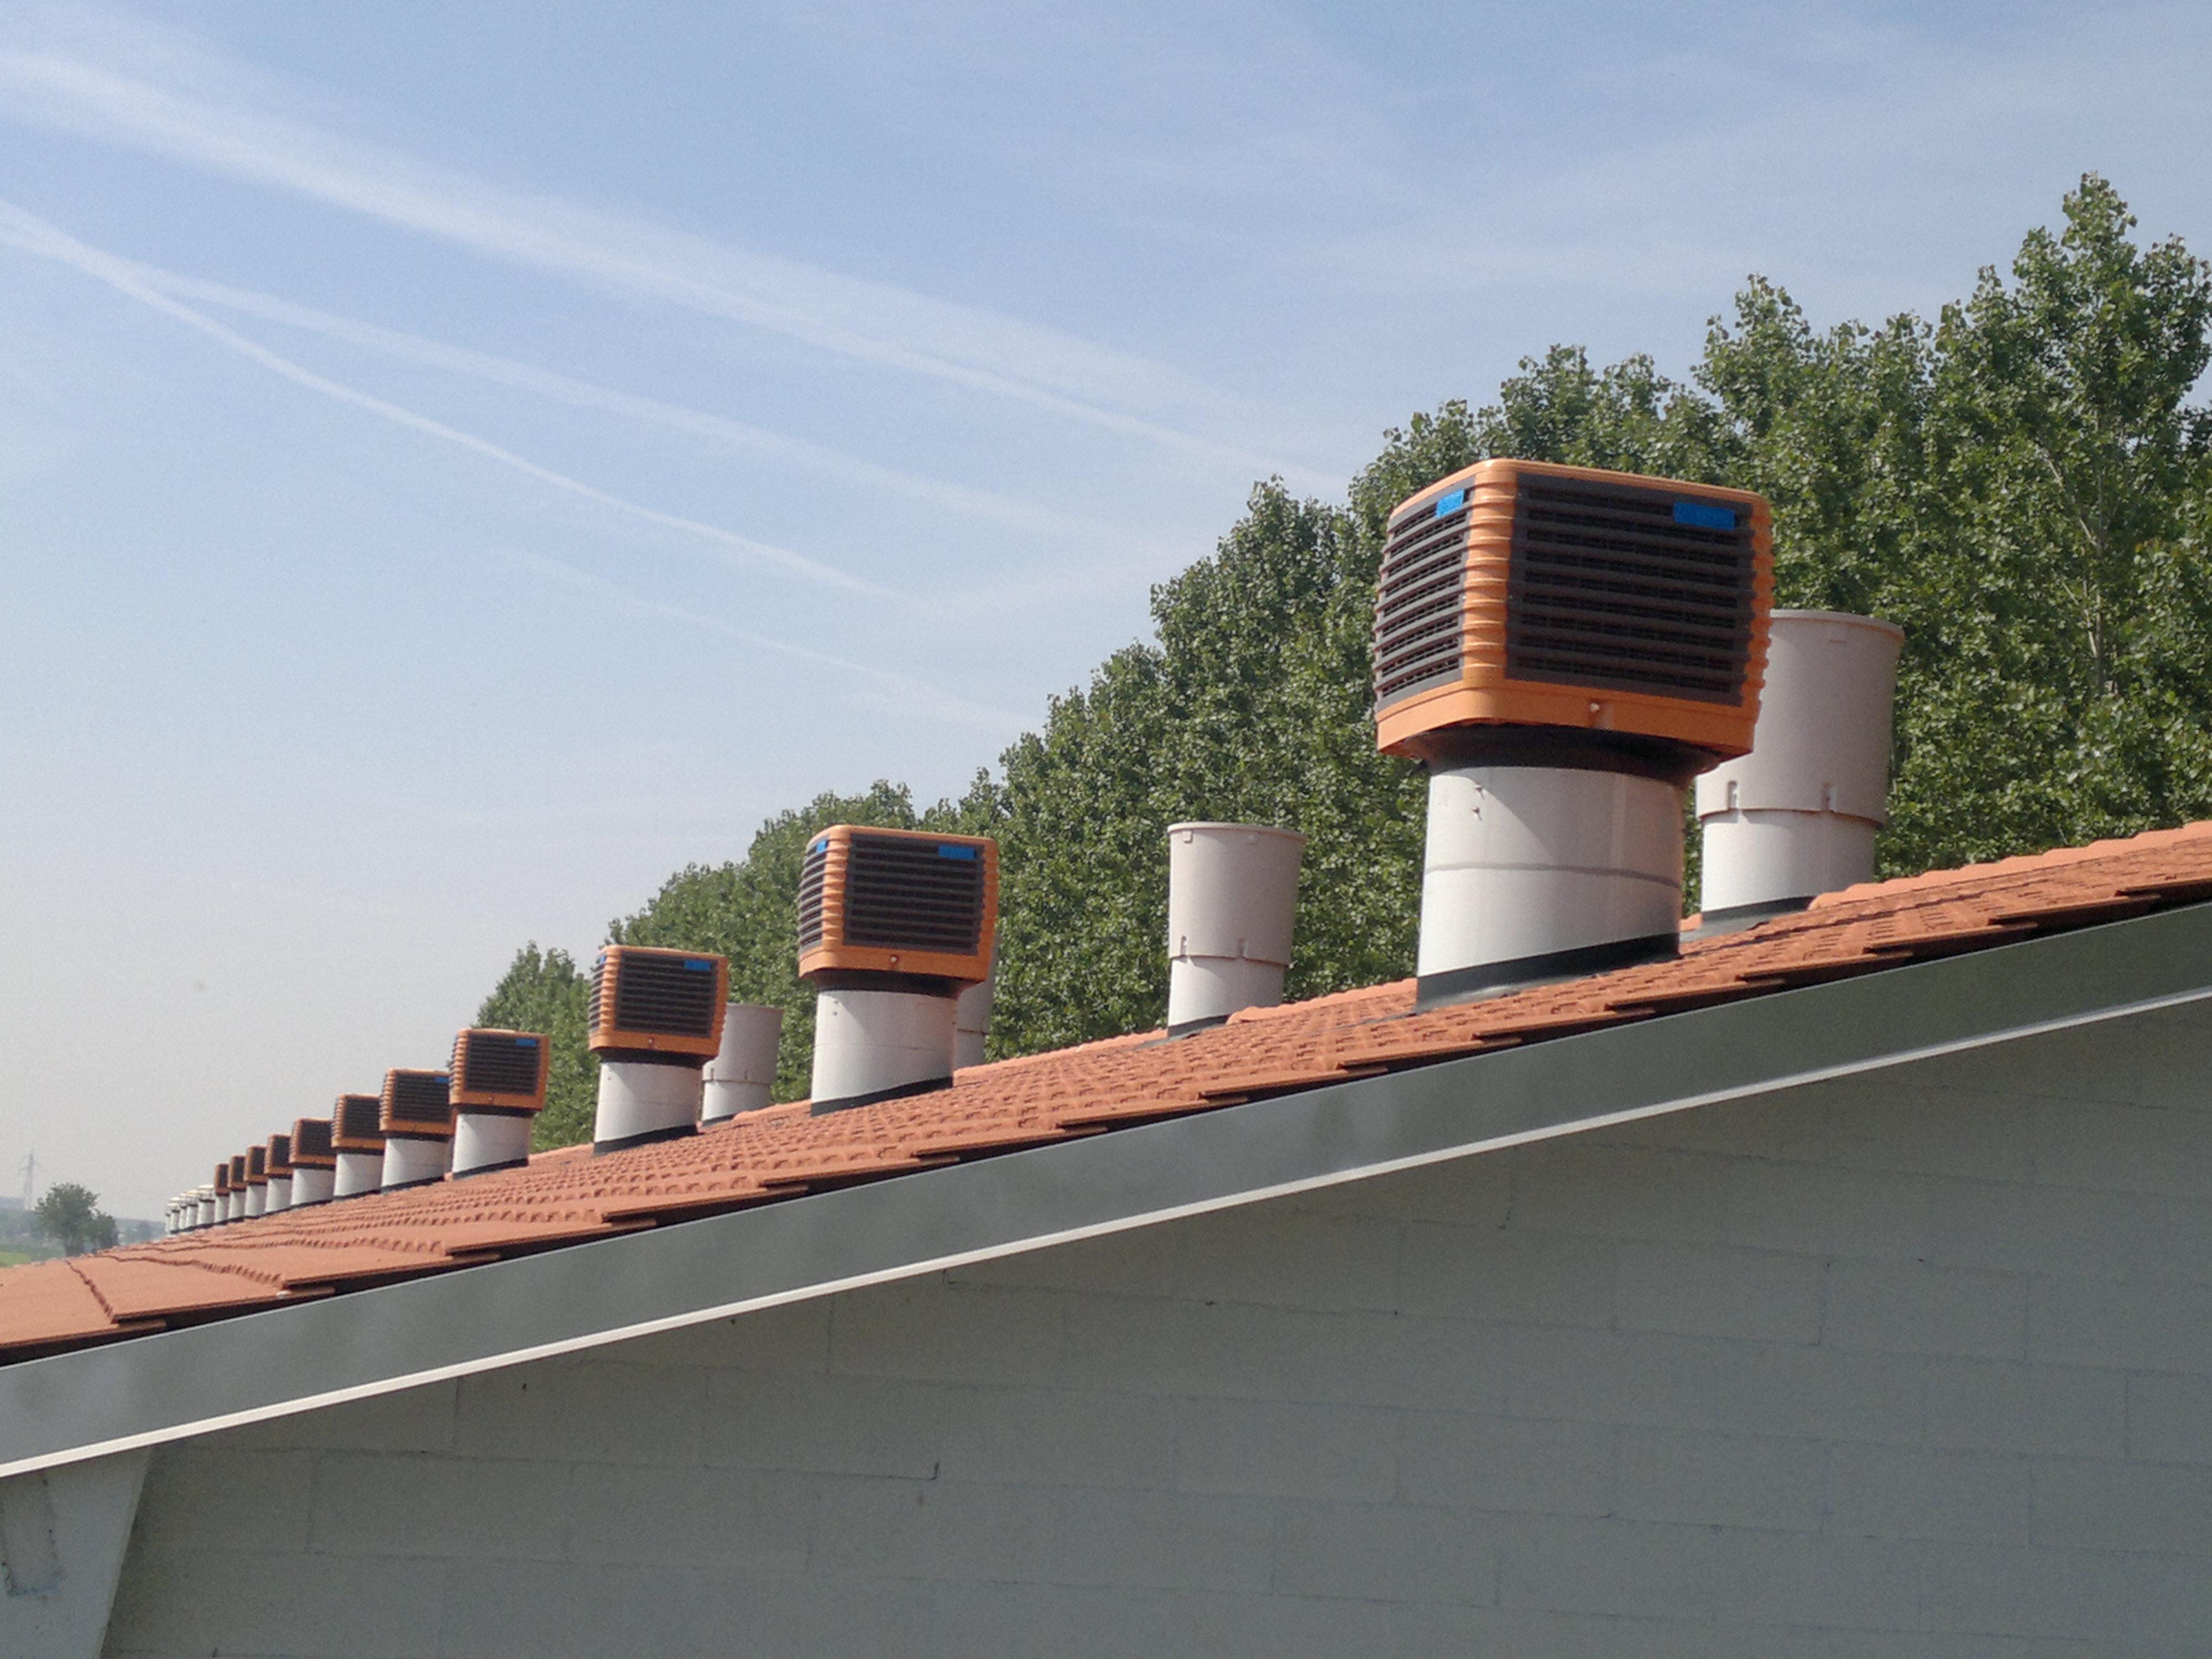 Franco-srl-Umidificazione-Raffrescamento-RoofCooler-industria-zootecnia